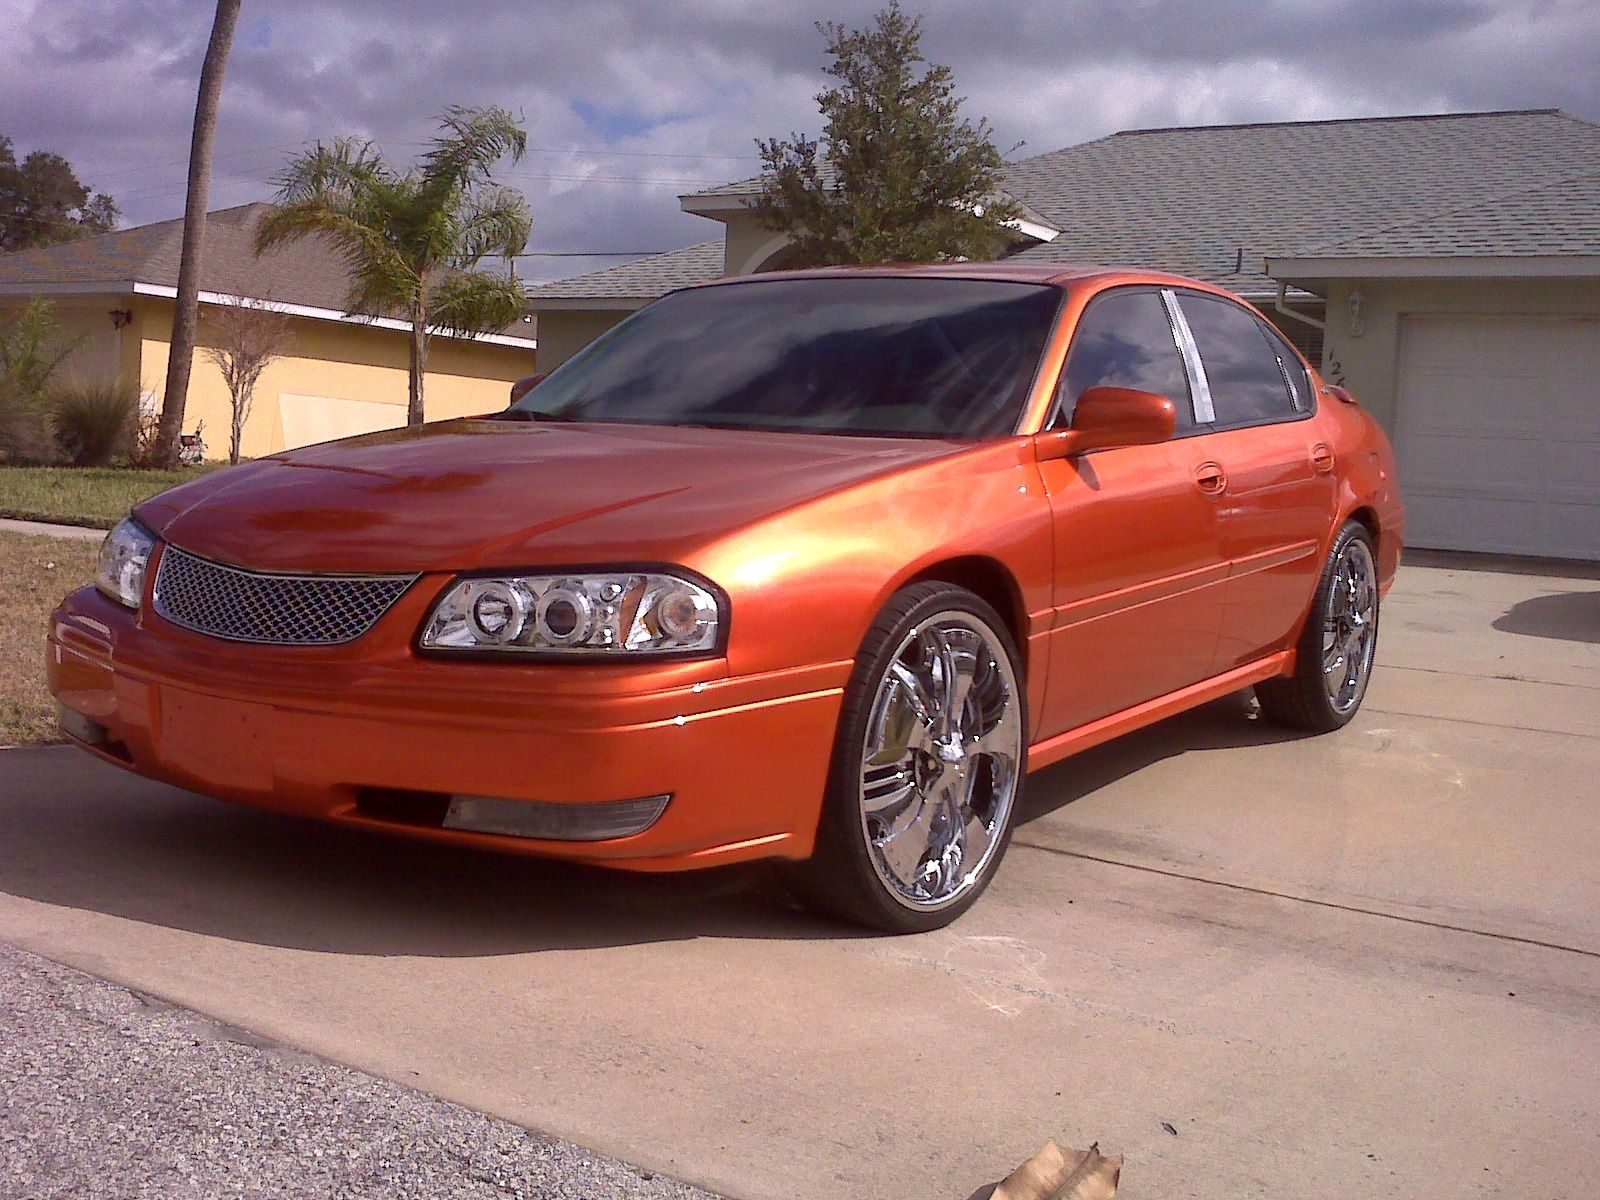 medium resolution of 2000 chevy impala swangin n bangin s 2000 chevrolet impala in miami fl